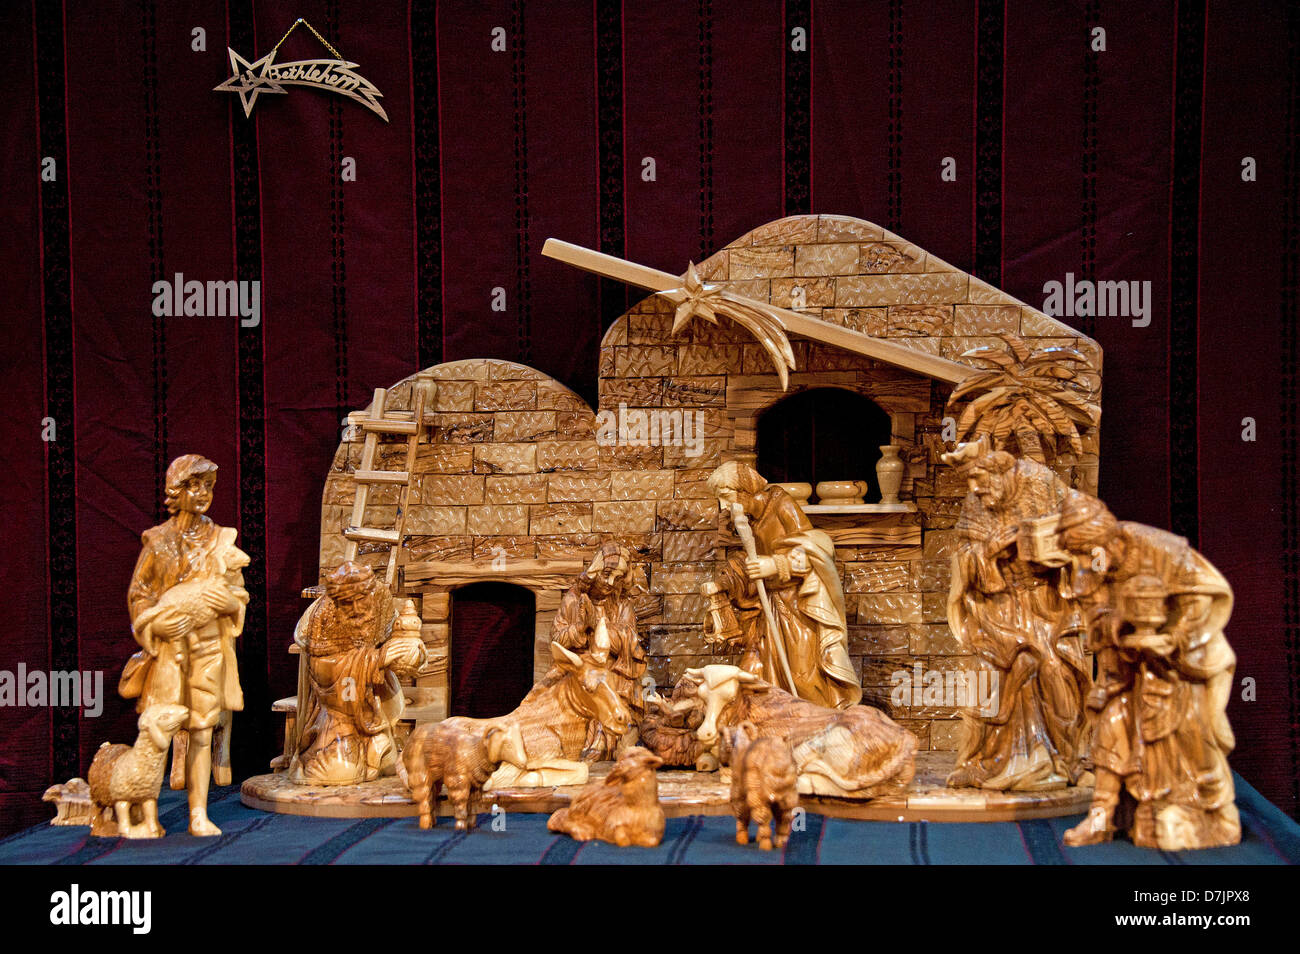 Berceau de bois sculpté de Noël Photo Stock